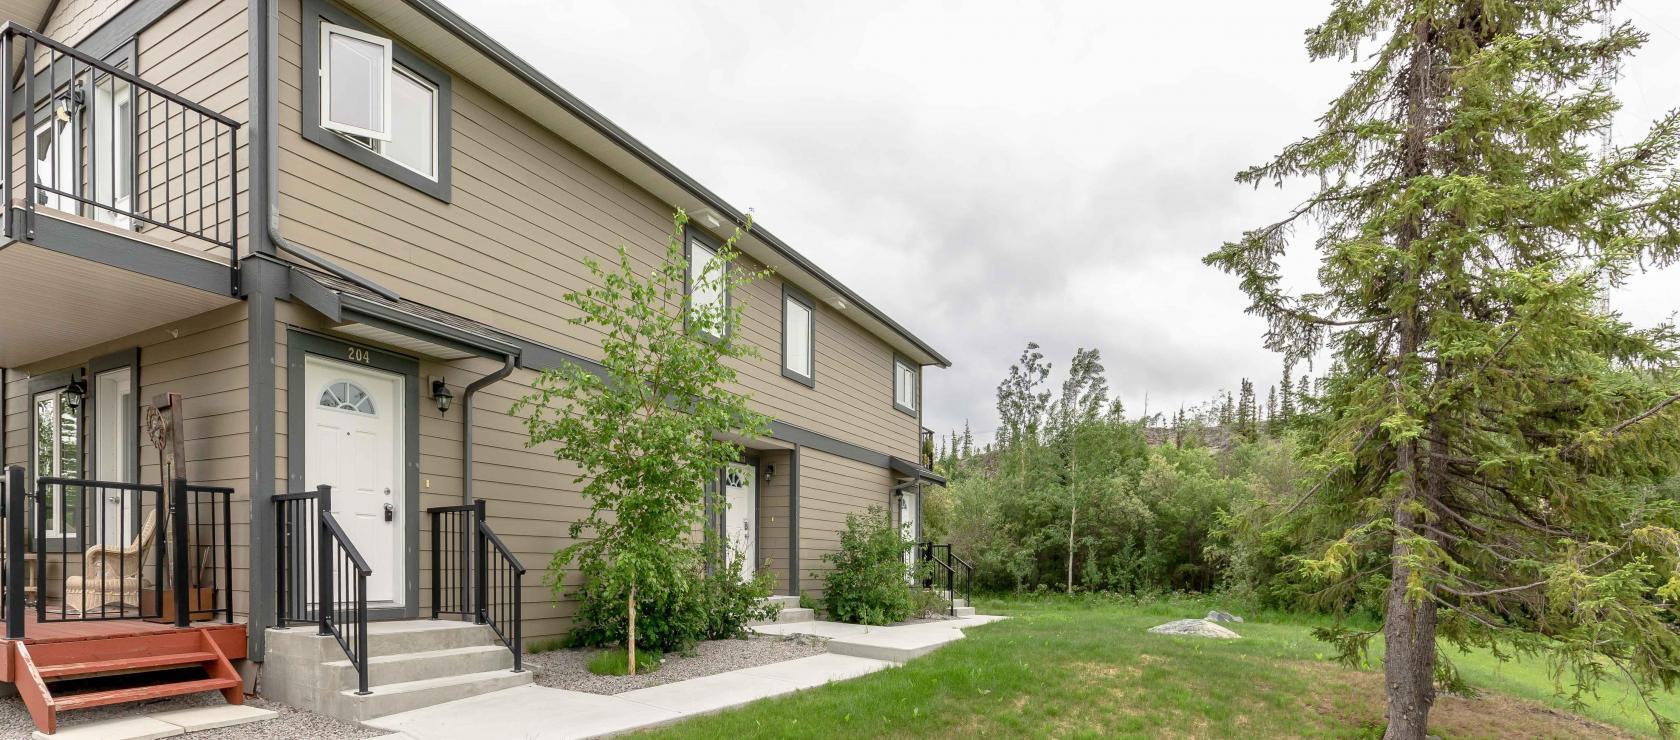 103 - 4852 School Draw Avenue, Yellowknife 2